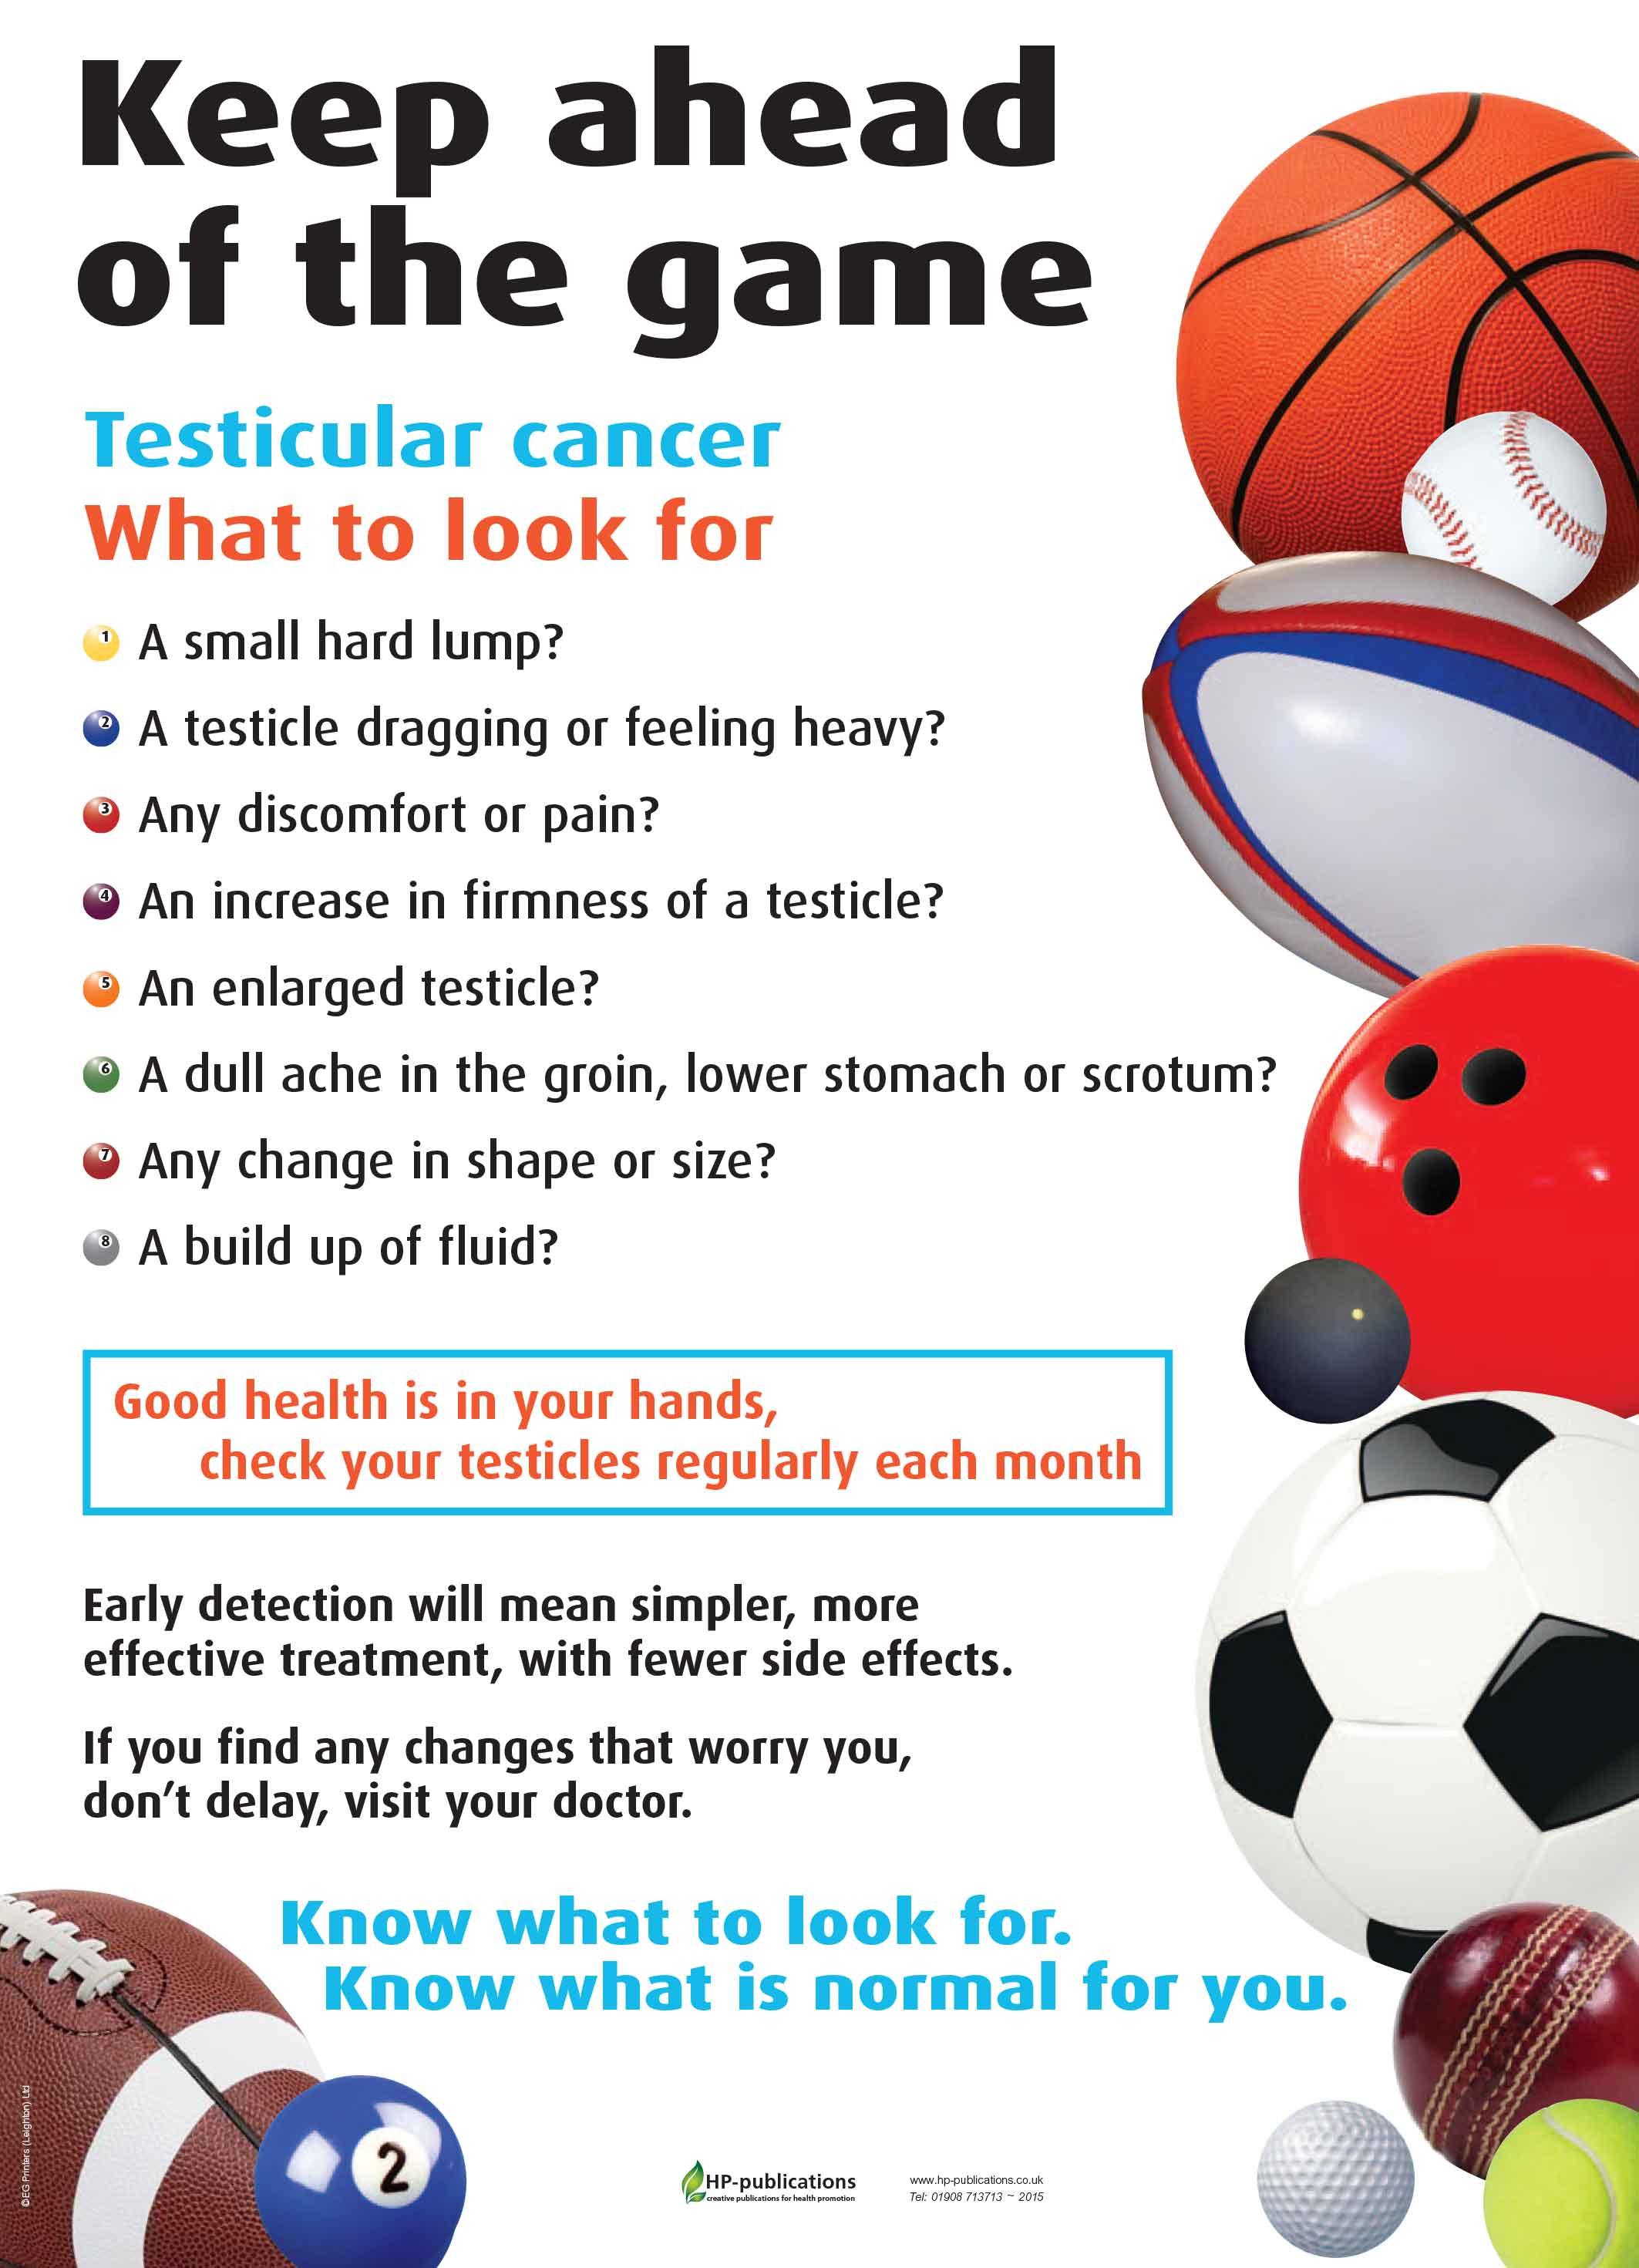 Mens health gay test